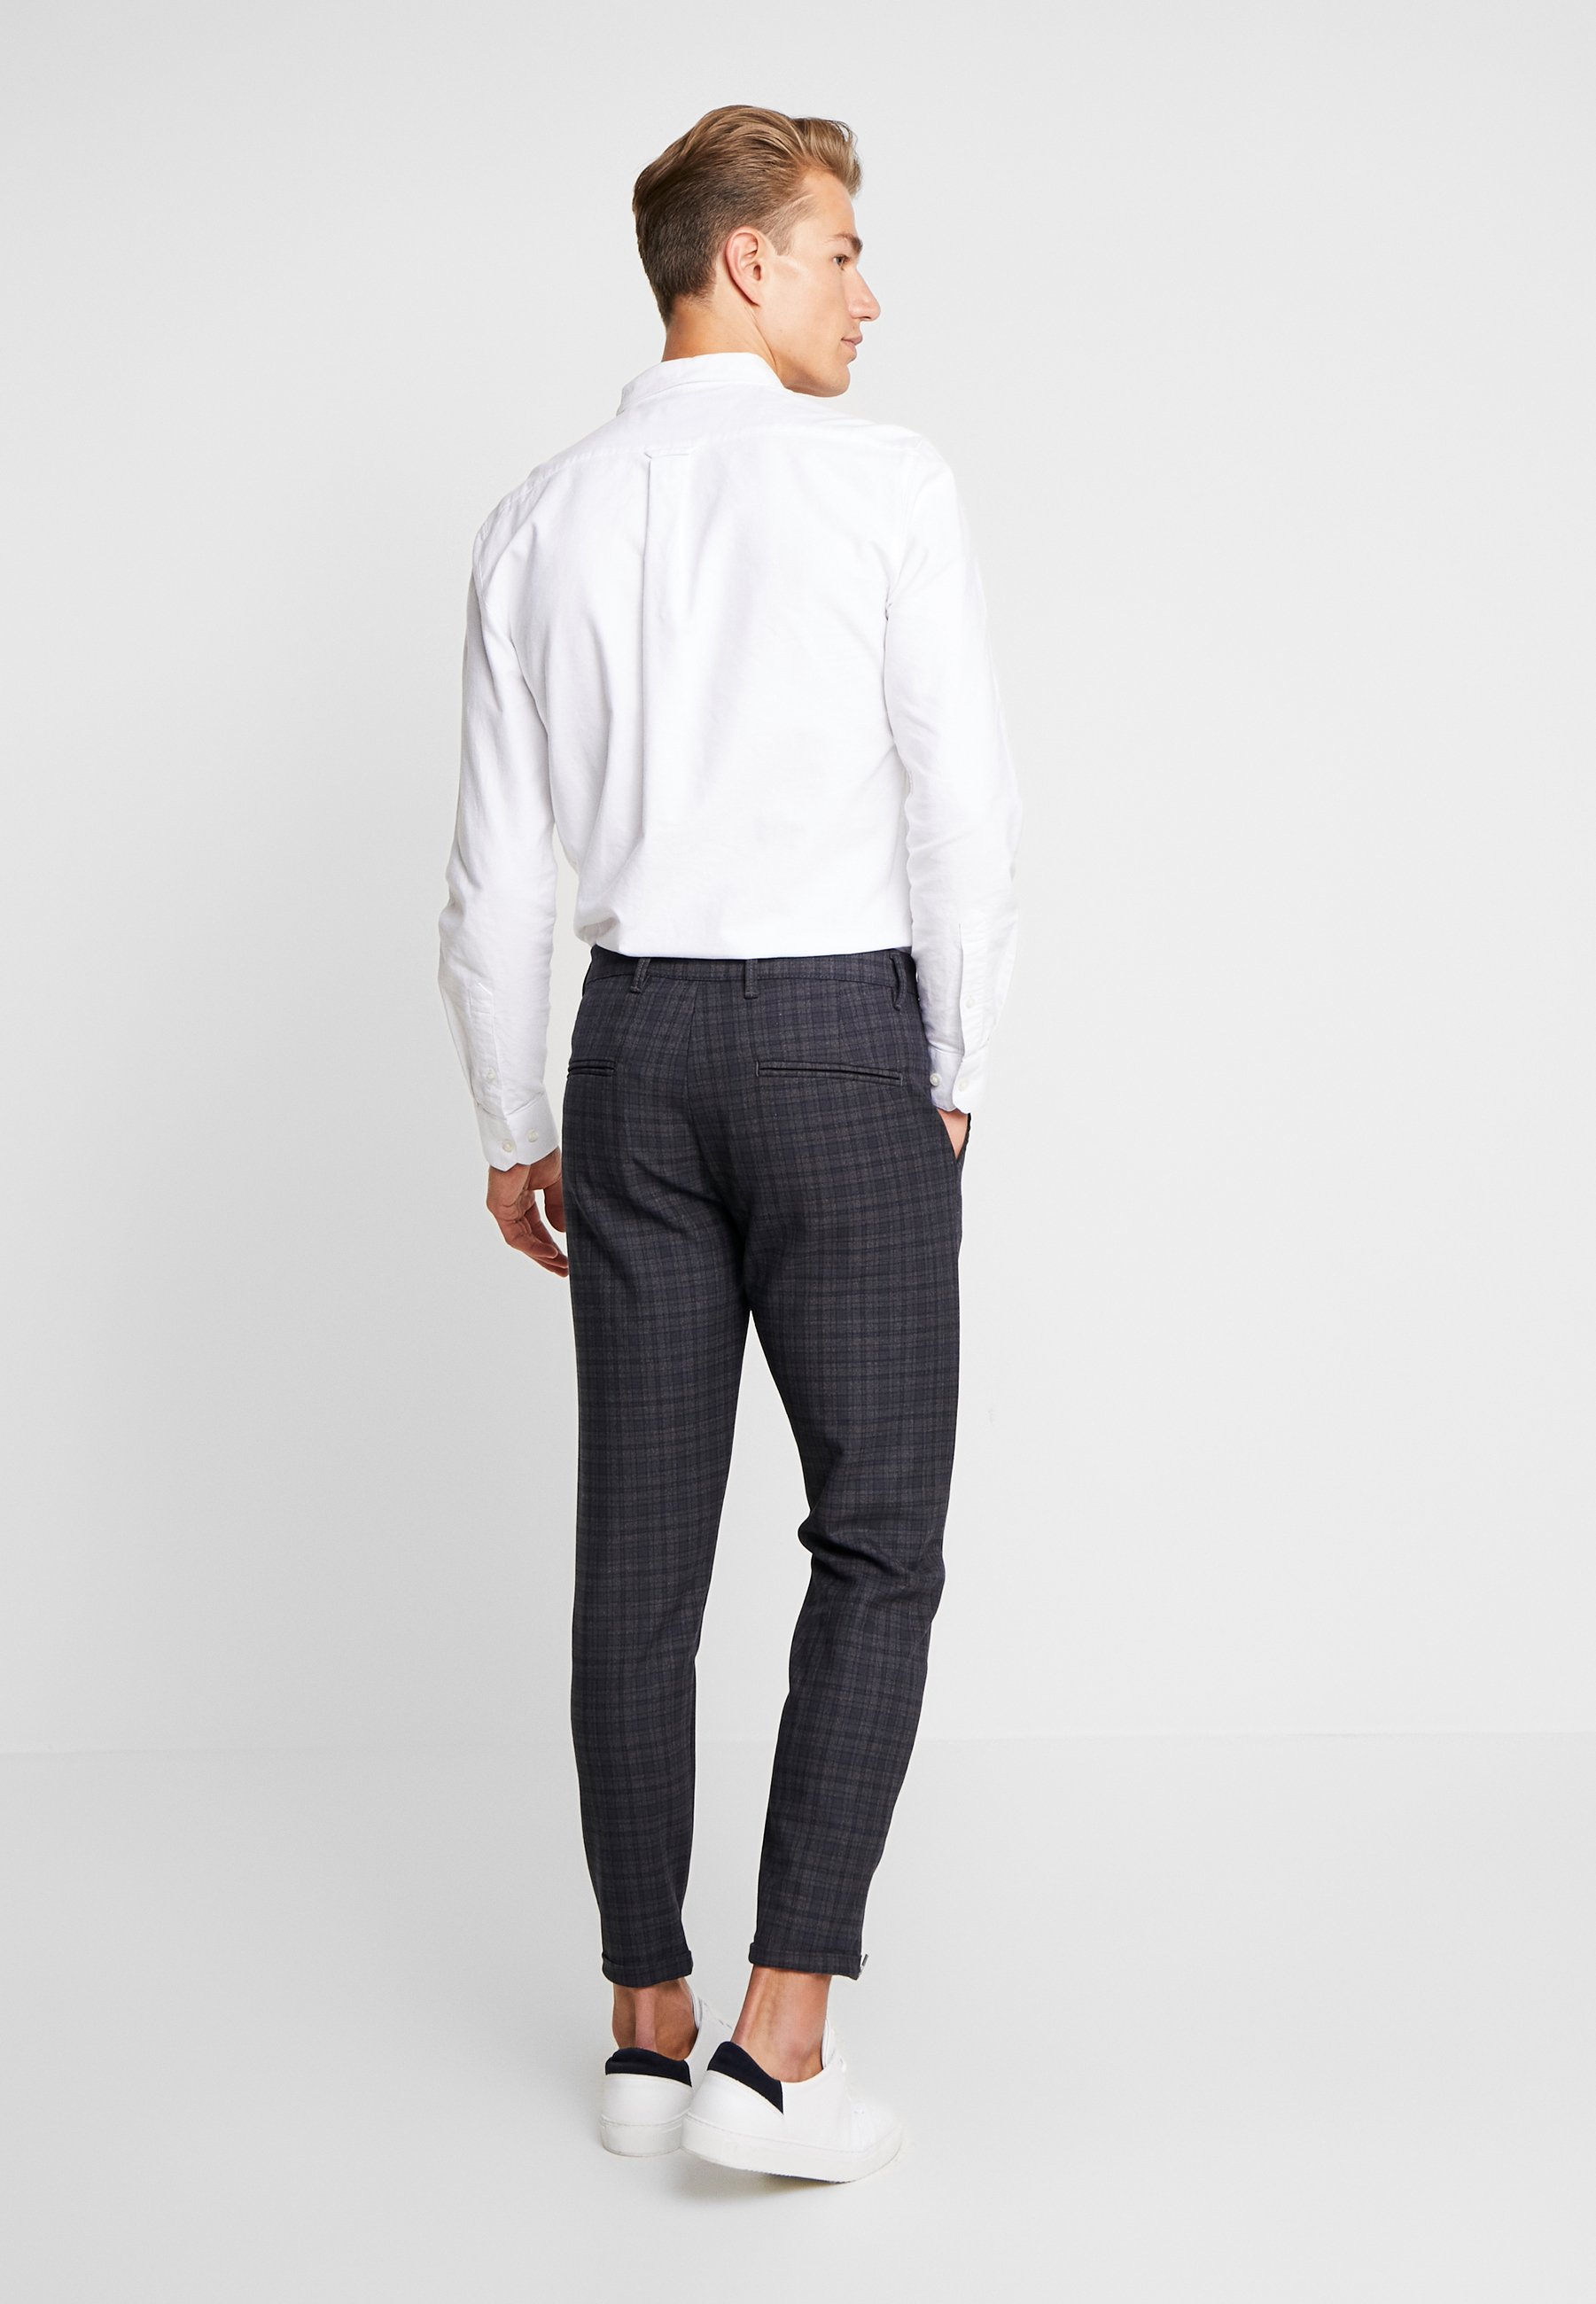 Check Pisa PantsPantalon Classique Grey Redue Gabba n8wk0PO